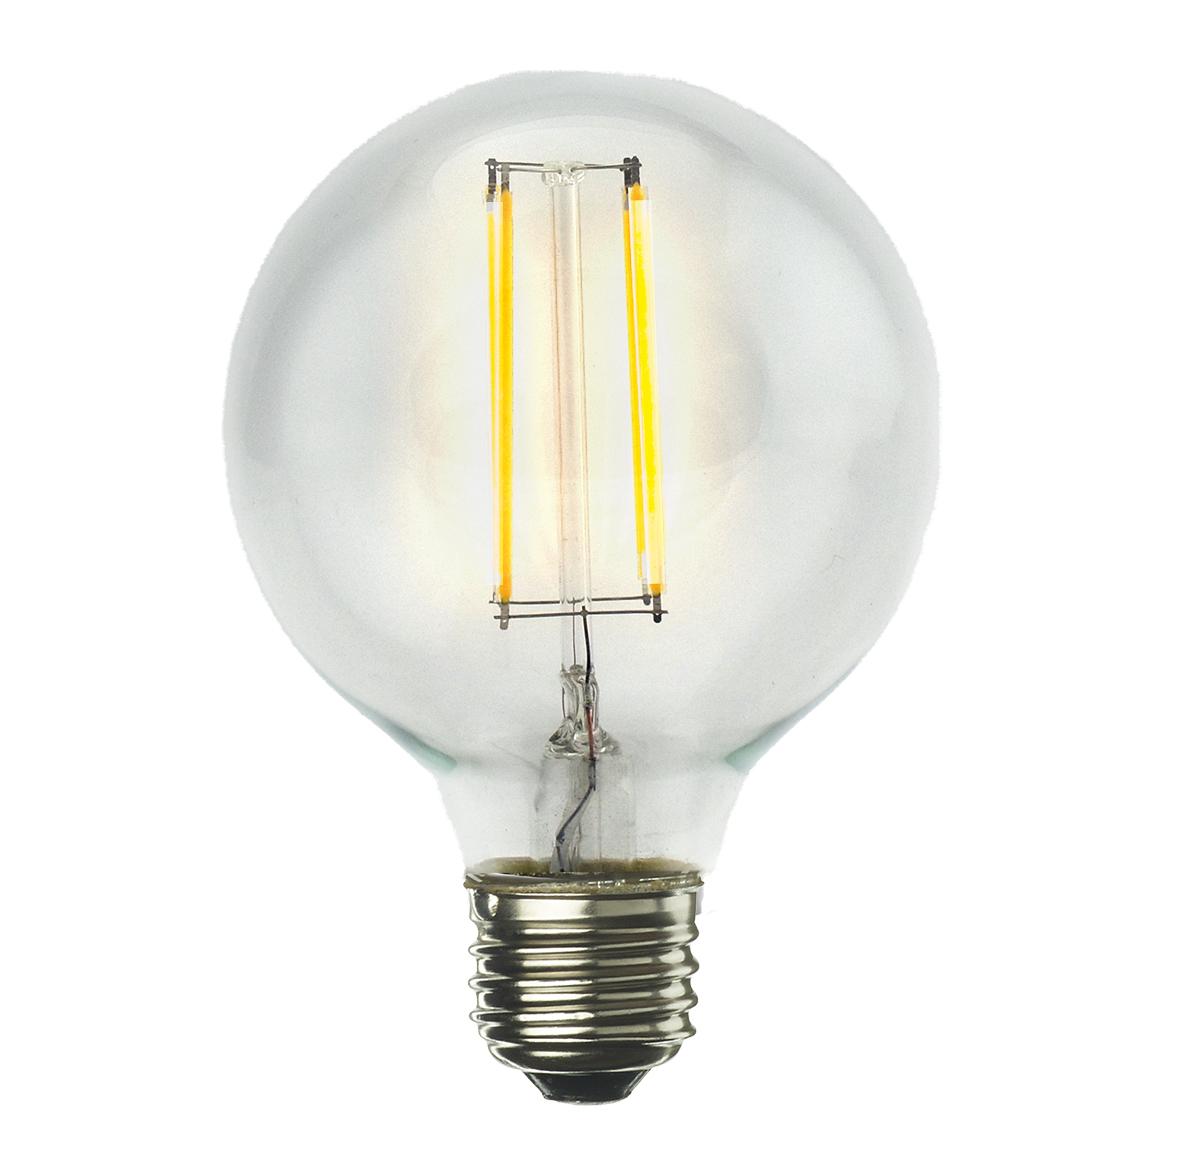 Lamp Parts - Lighting Parts - Chandelier Parts | 7W Led ...